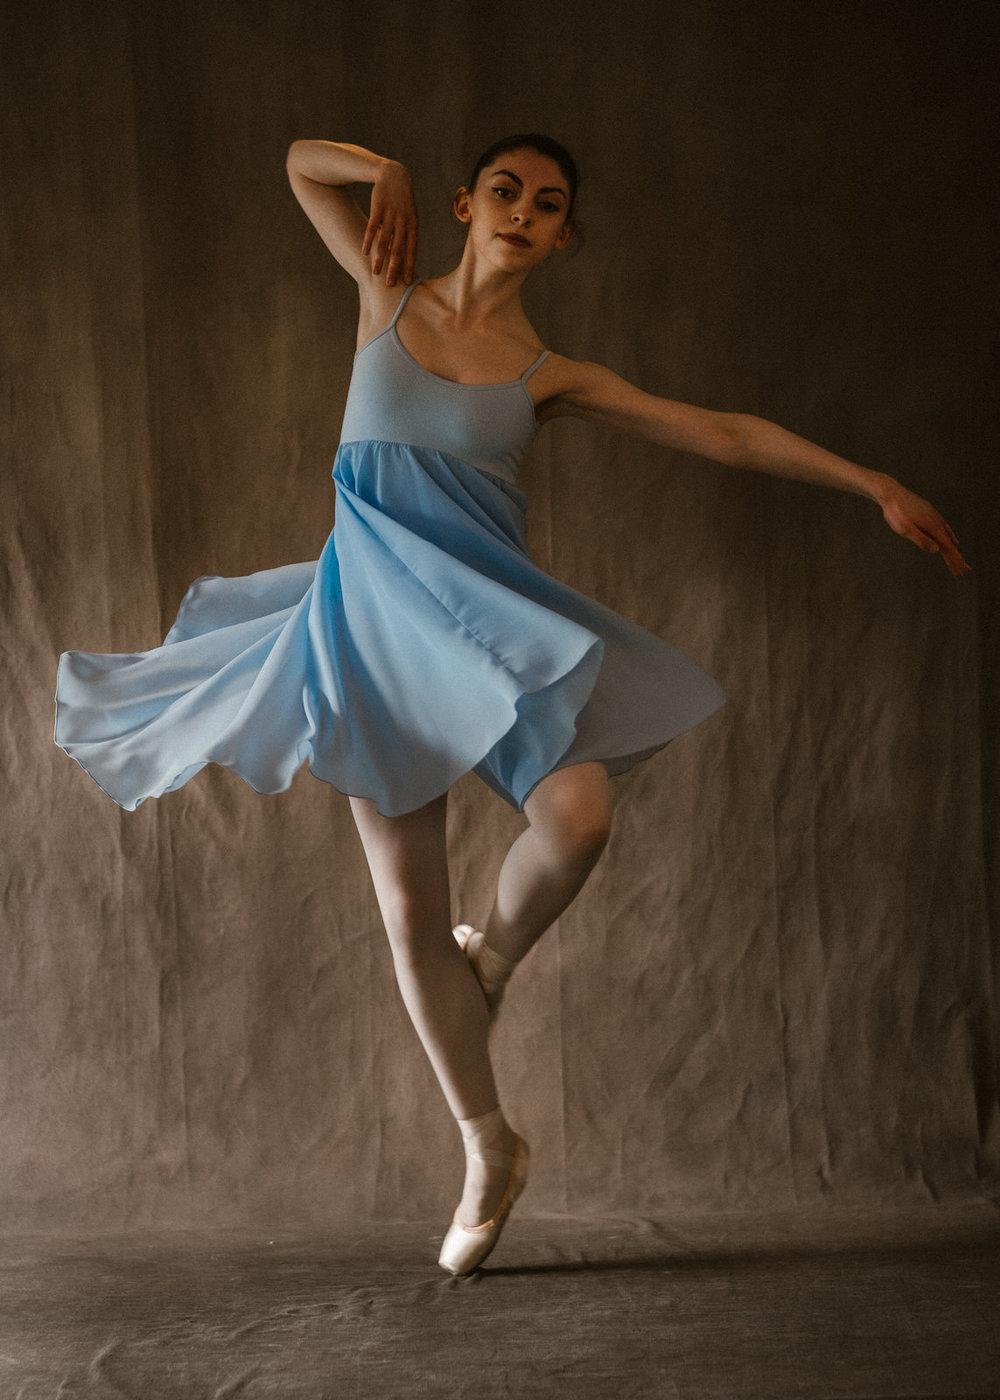 Sarah_Nolan_Ballet_017.jpg